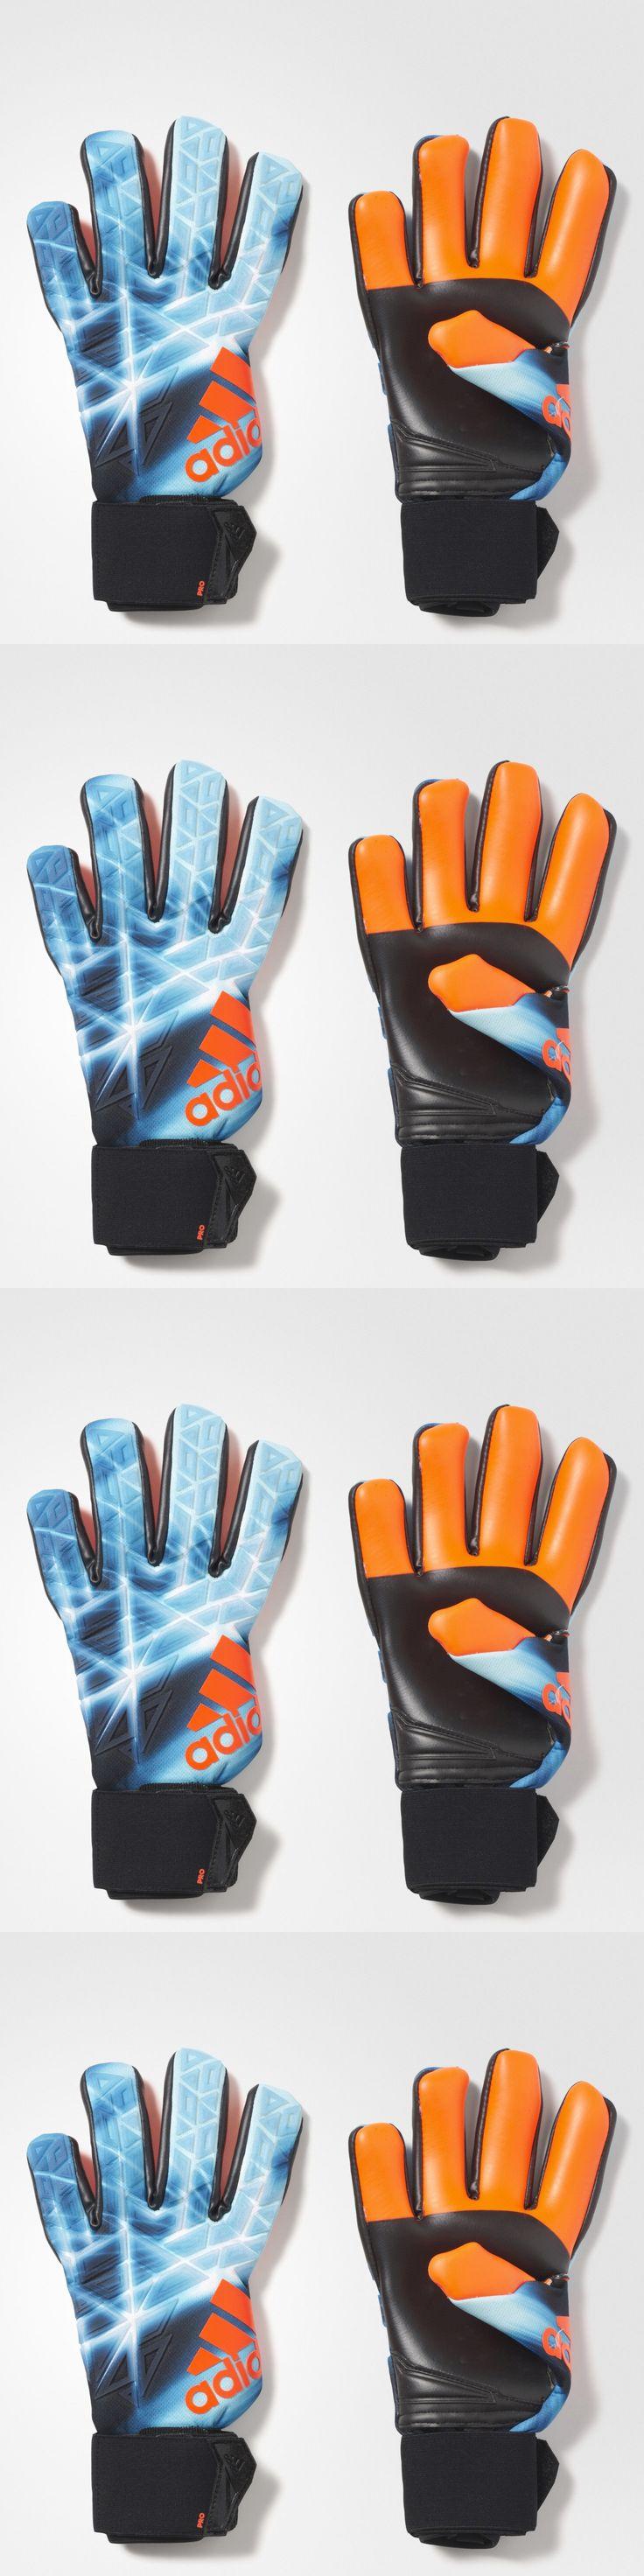 Gloves 57277: Adidas Ace Trans Pro Manuel Neuer Soccer Goalkeeper Gloves (Blue/Orange) Az3701* -> BUY IT NOW ONLY: $104.99 on eBay!